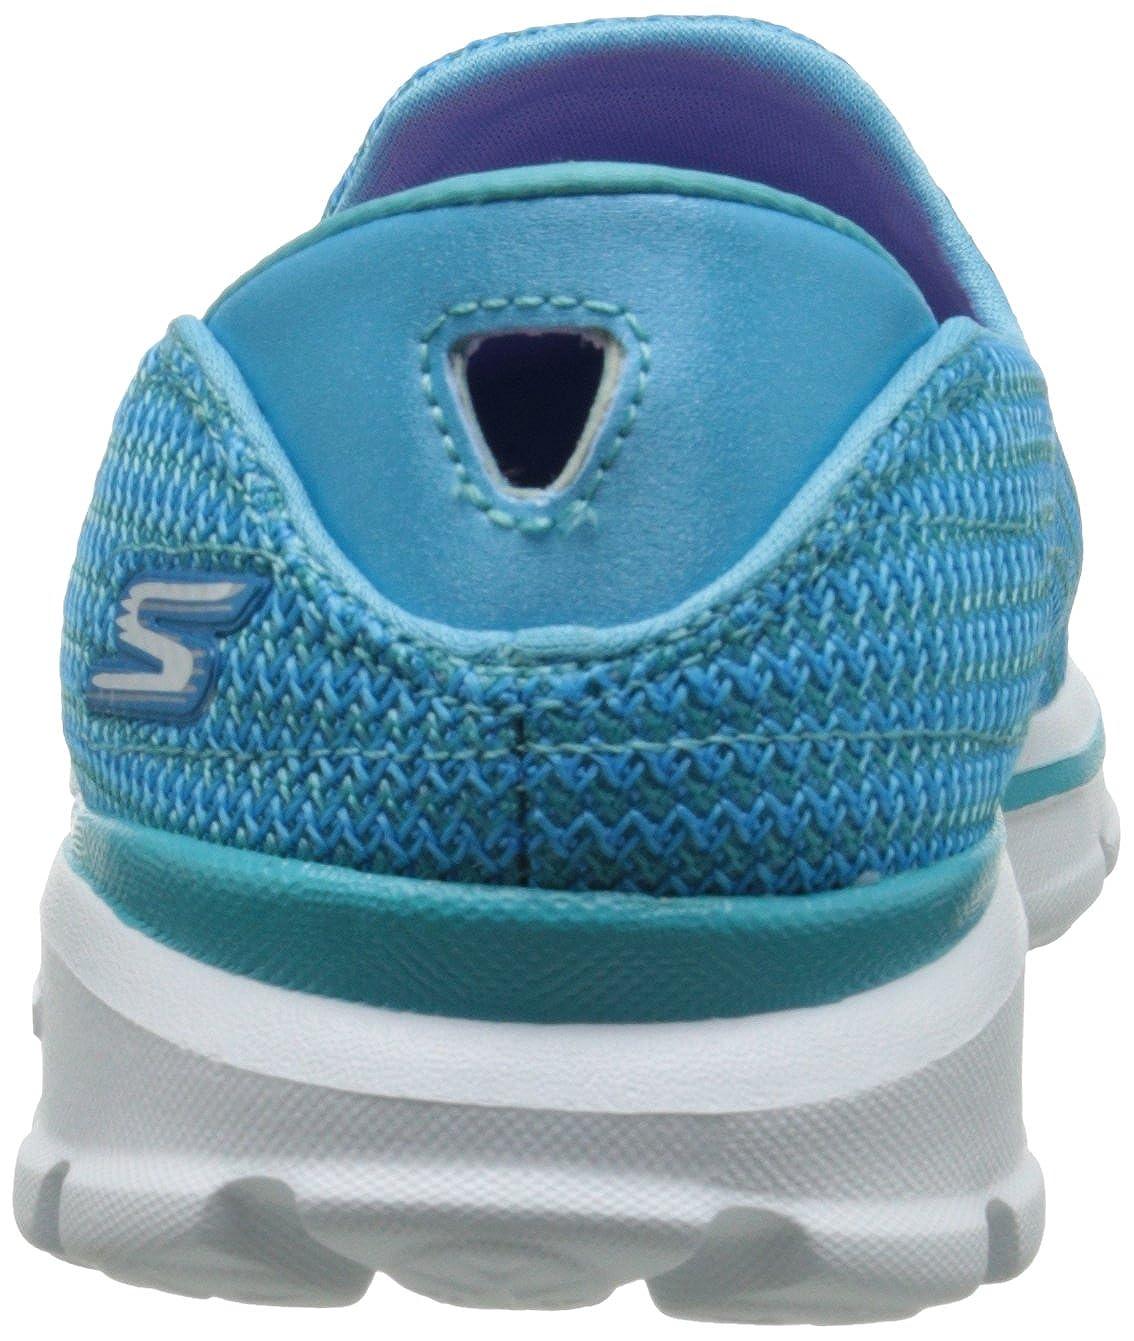 SkechersGo Walk 3 - Scarpe Scarpe Scarpe da Ginnastica Basse Donna   Nuovo  280b3e